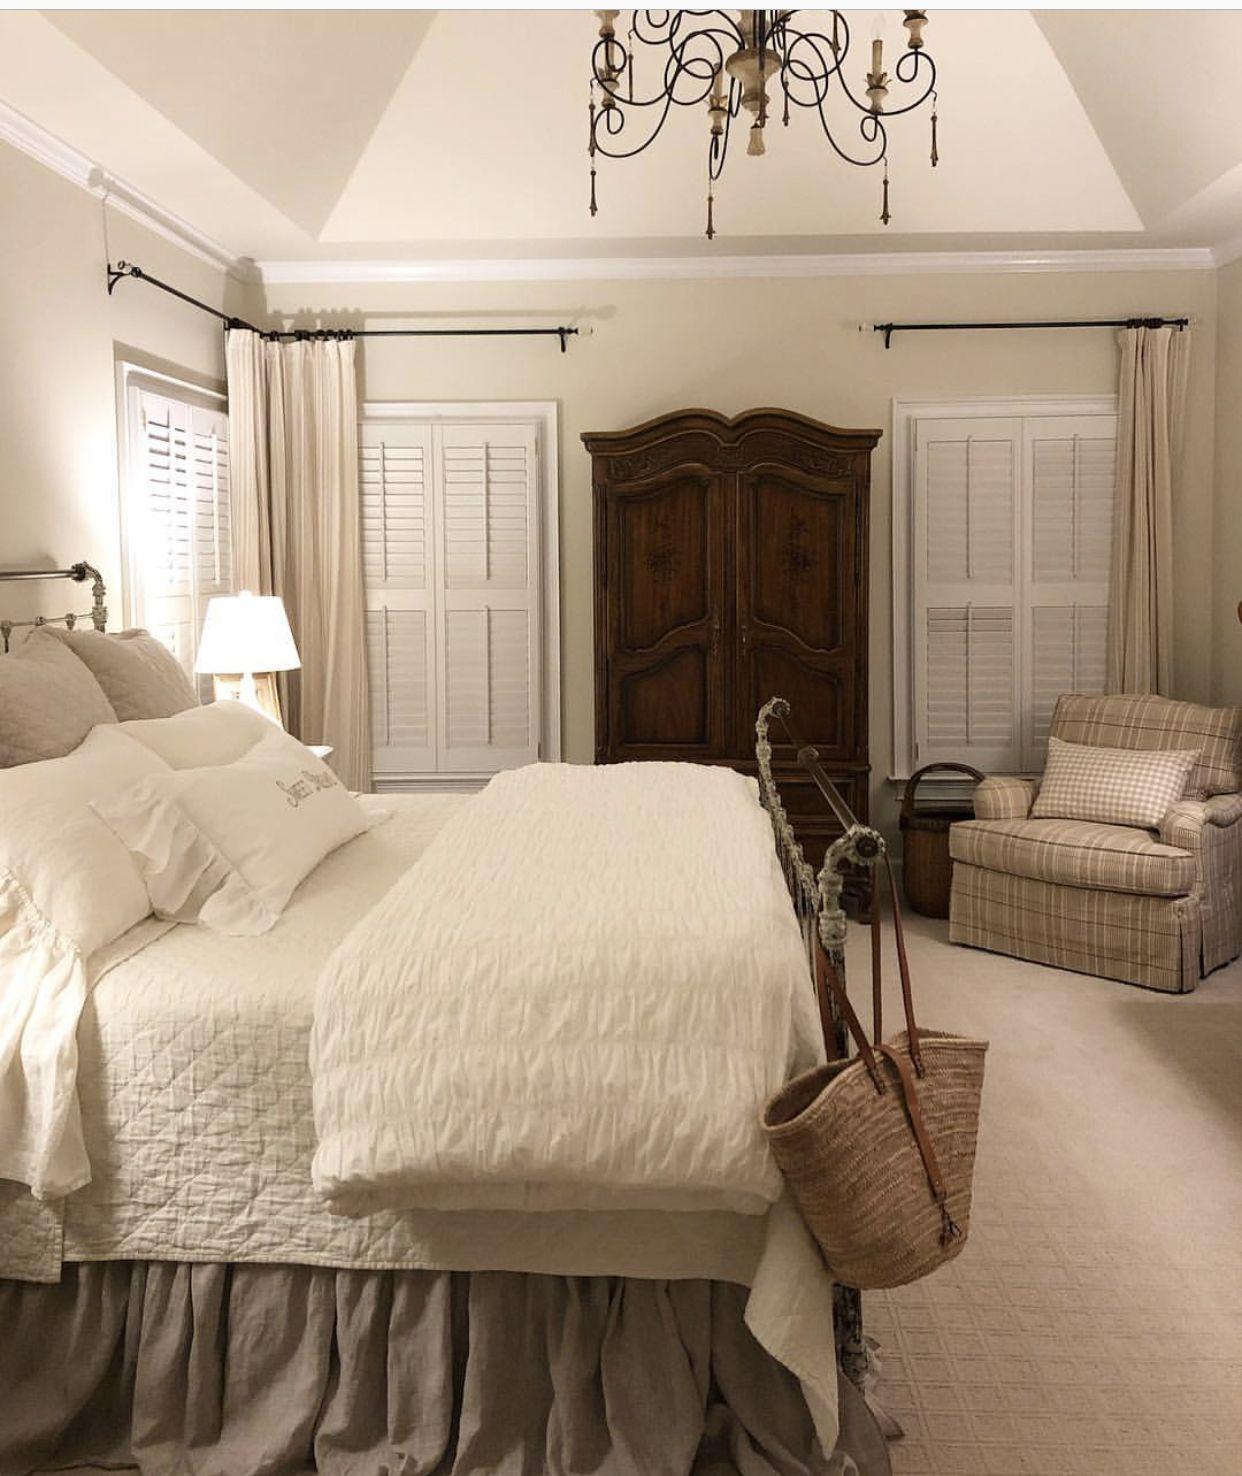 Vintage French Soul Cozy Home Decor Bedroom Master Bedrooms Decor Bedroom Design